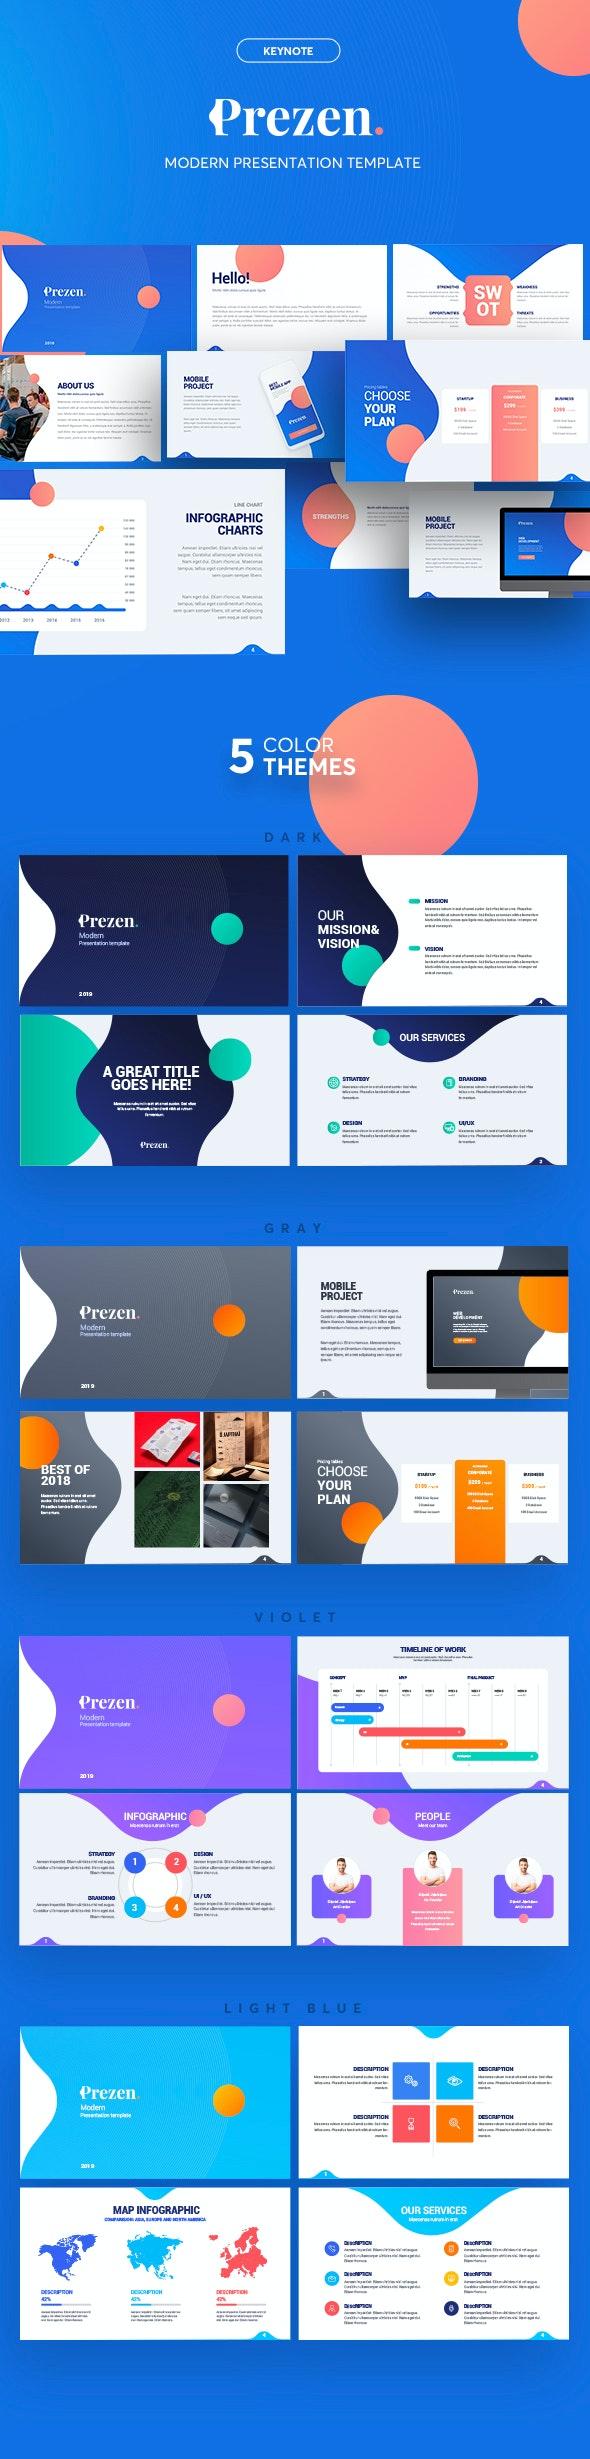 Prezen - Modern Presentation Template - Business Keynote Templates